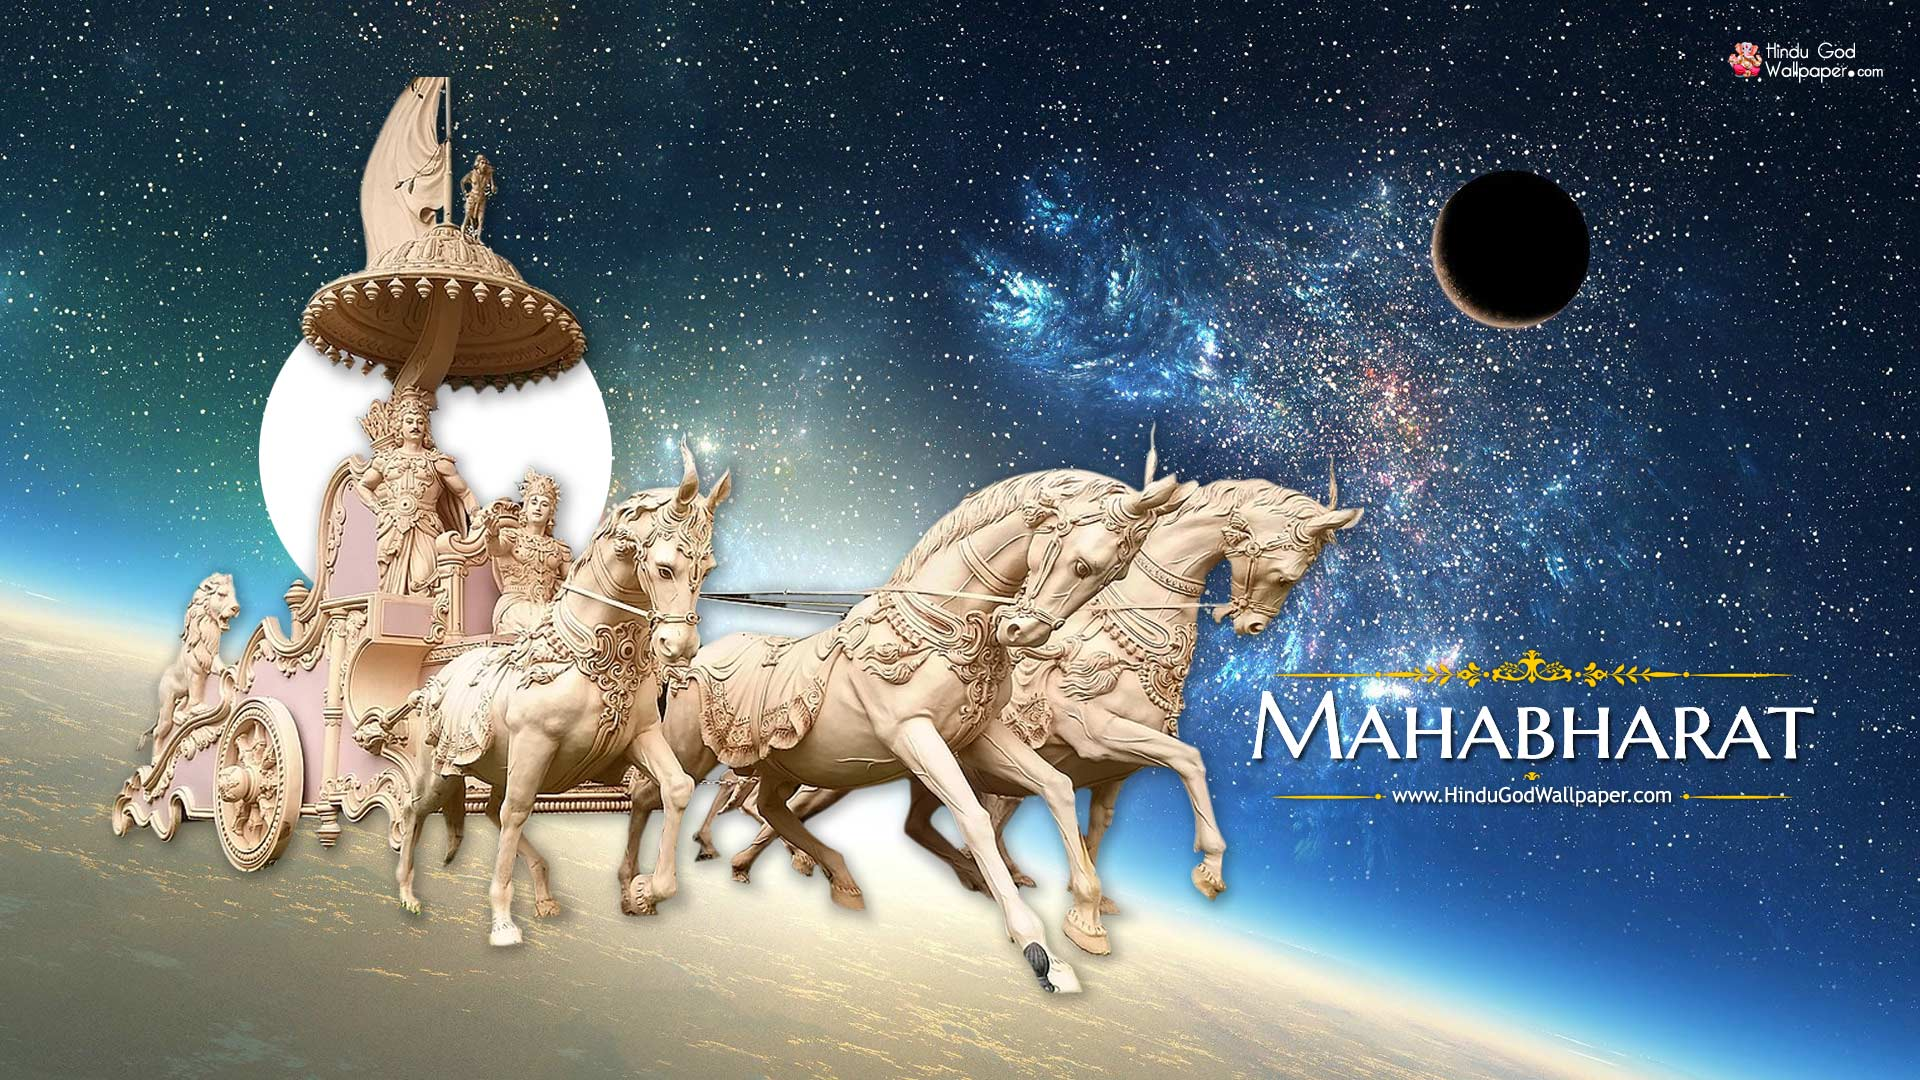 3812 mahabharat full hd wallpaper